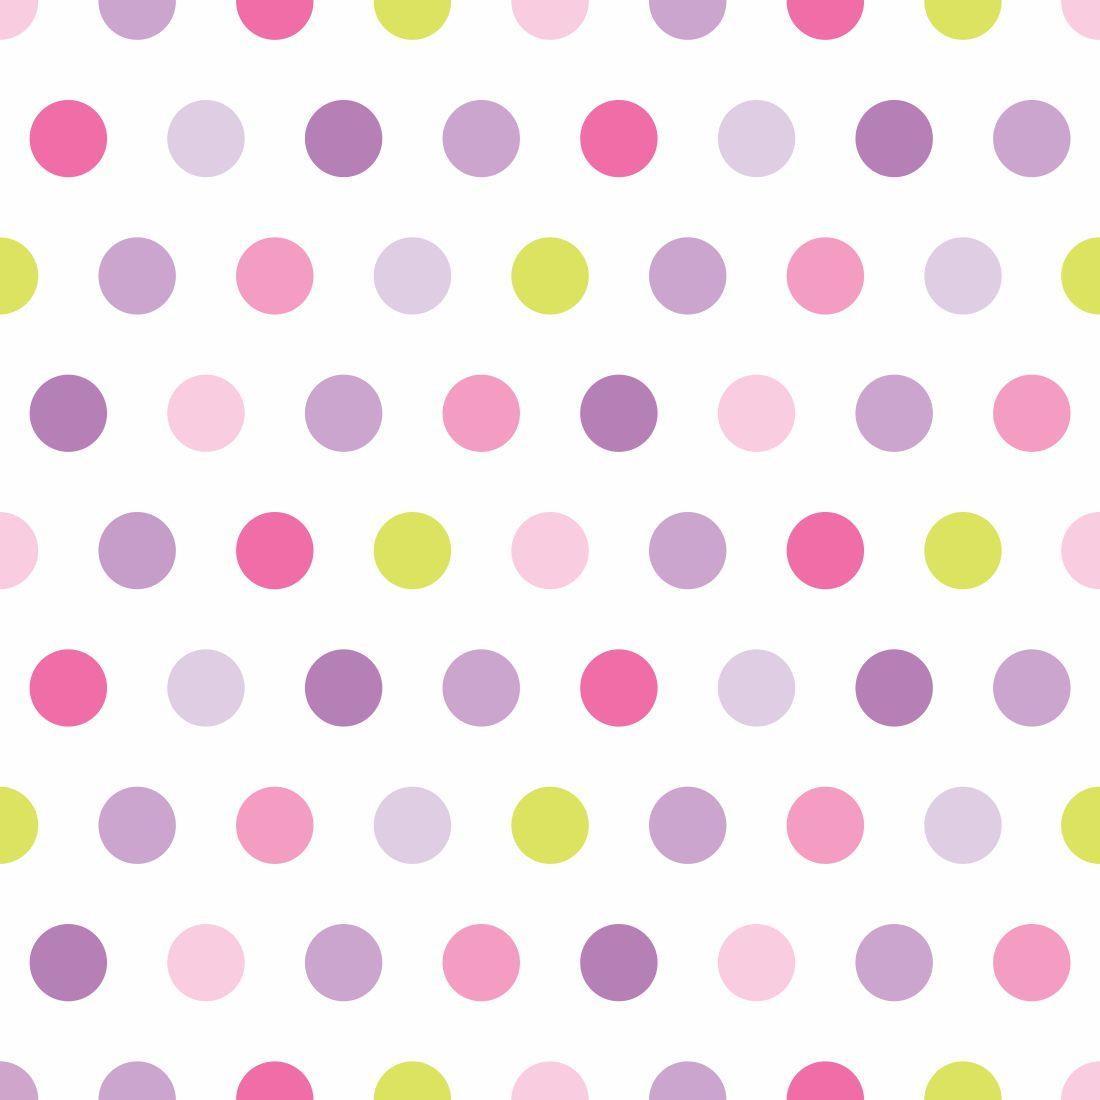 Dp and a polka dot dress 7